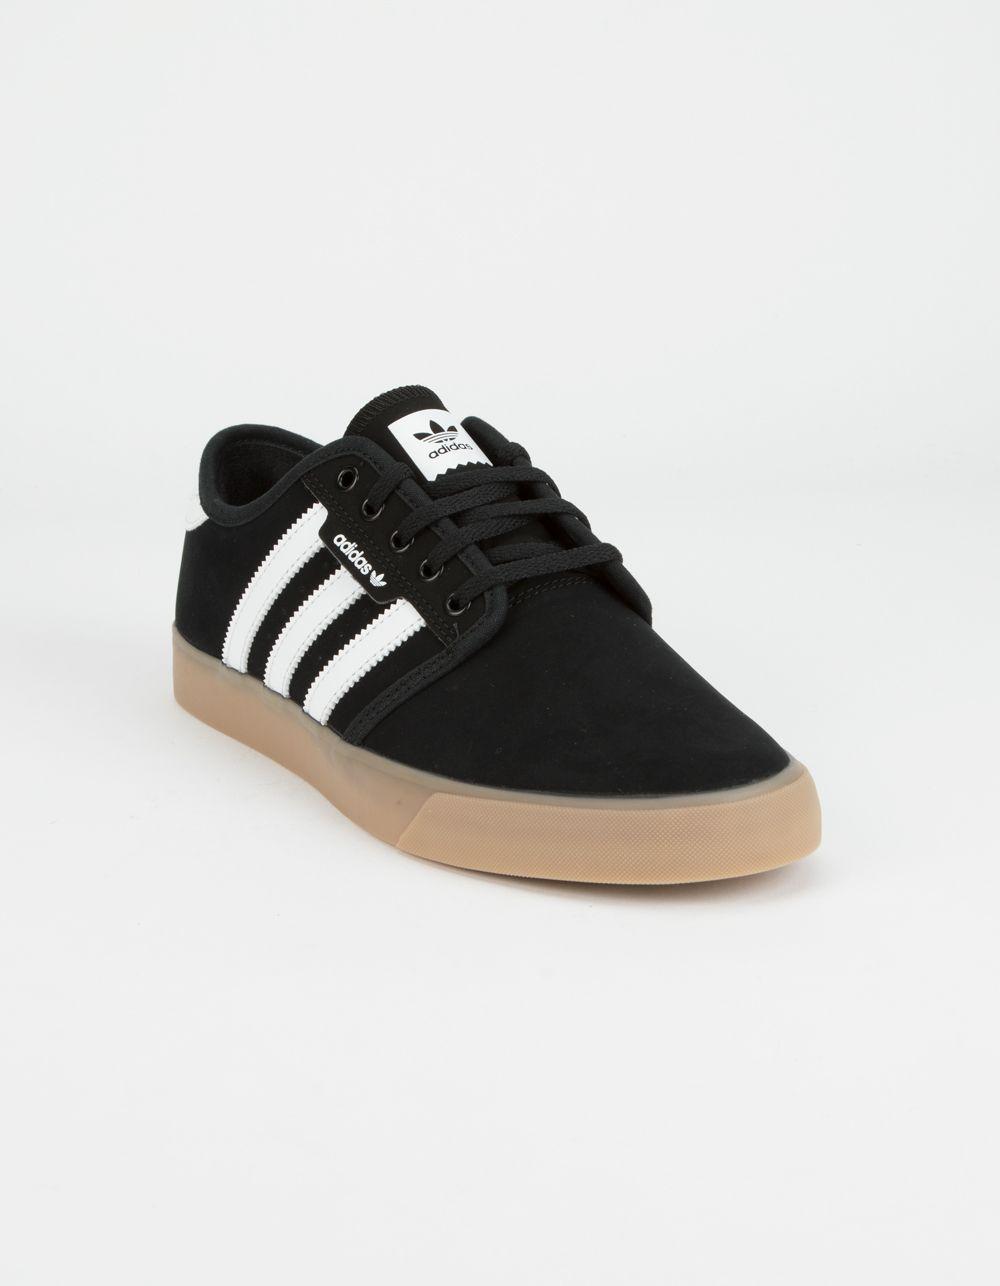 radio Presa pubertad  ADIDAS Seeley Core Black & Gum Shoes - BLACK - 347755100 | Shoes, Black  gums, Black shoes